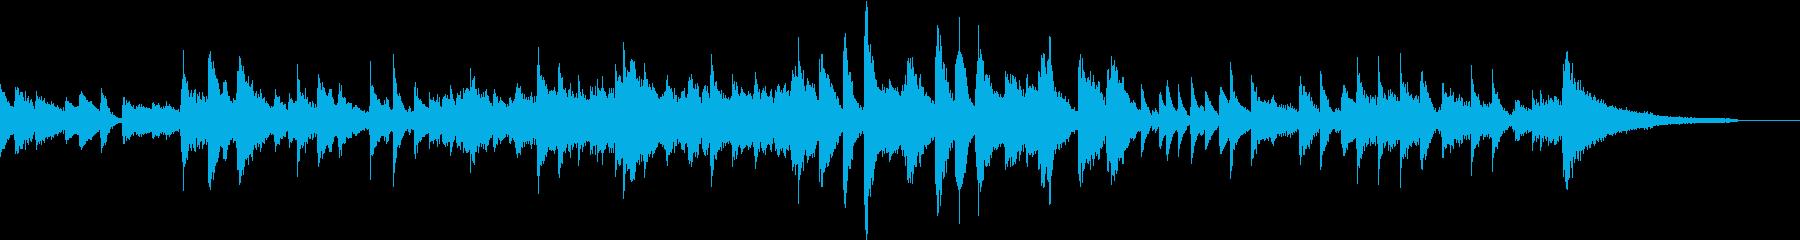 G線上のアリアピアノジャズ風CM向きの再生済みの波形